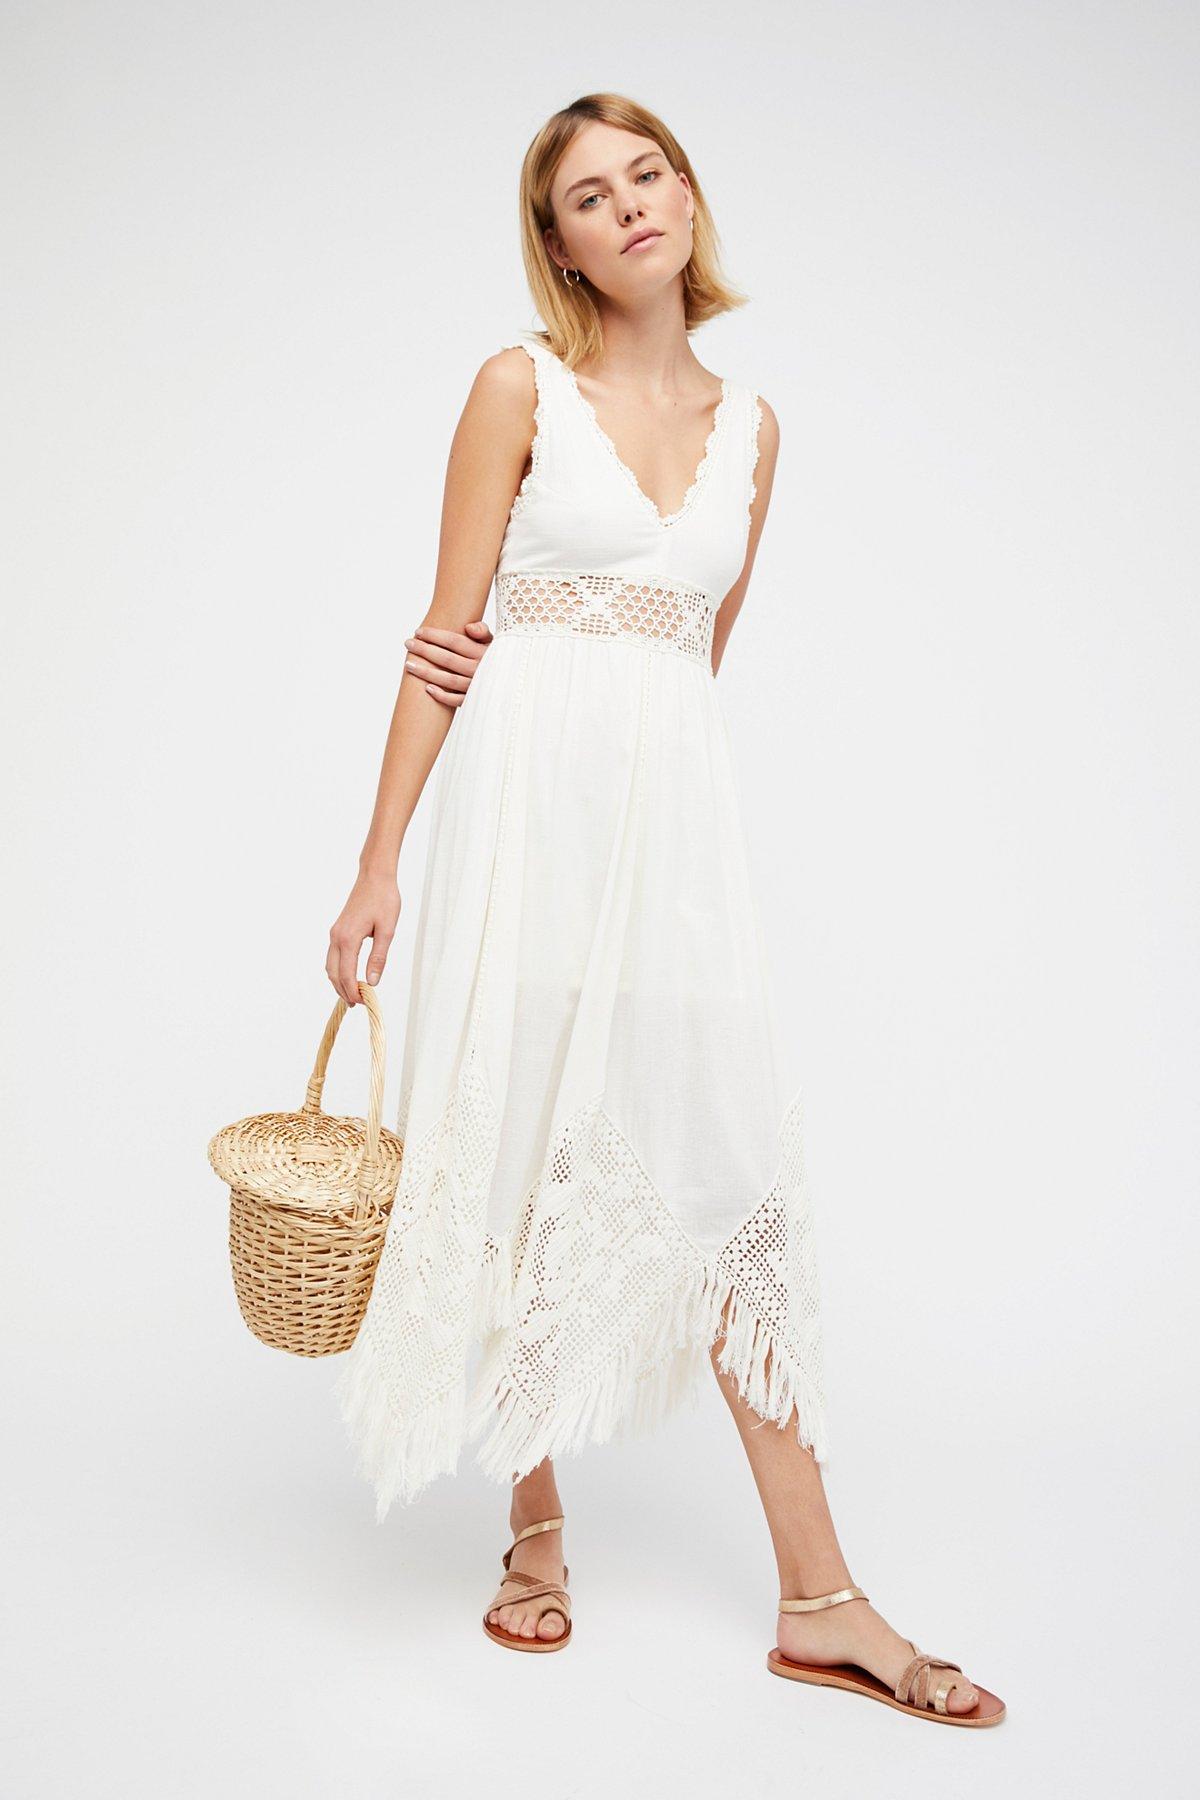 White Moon菱形图案长裙